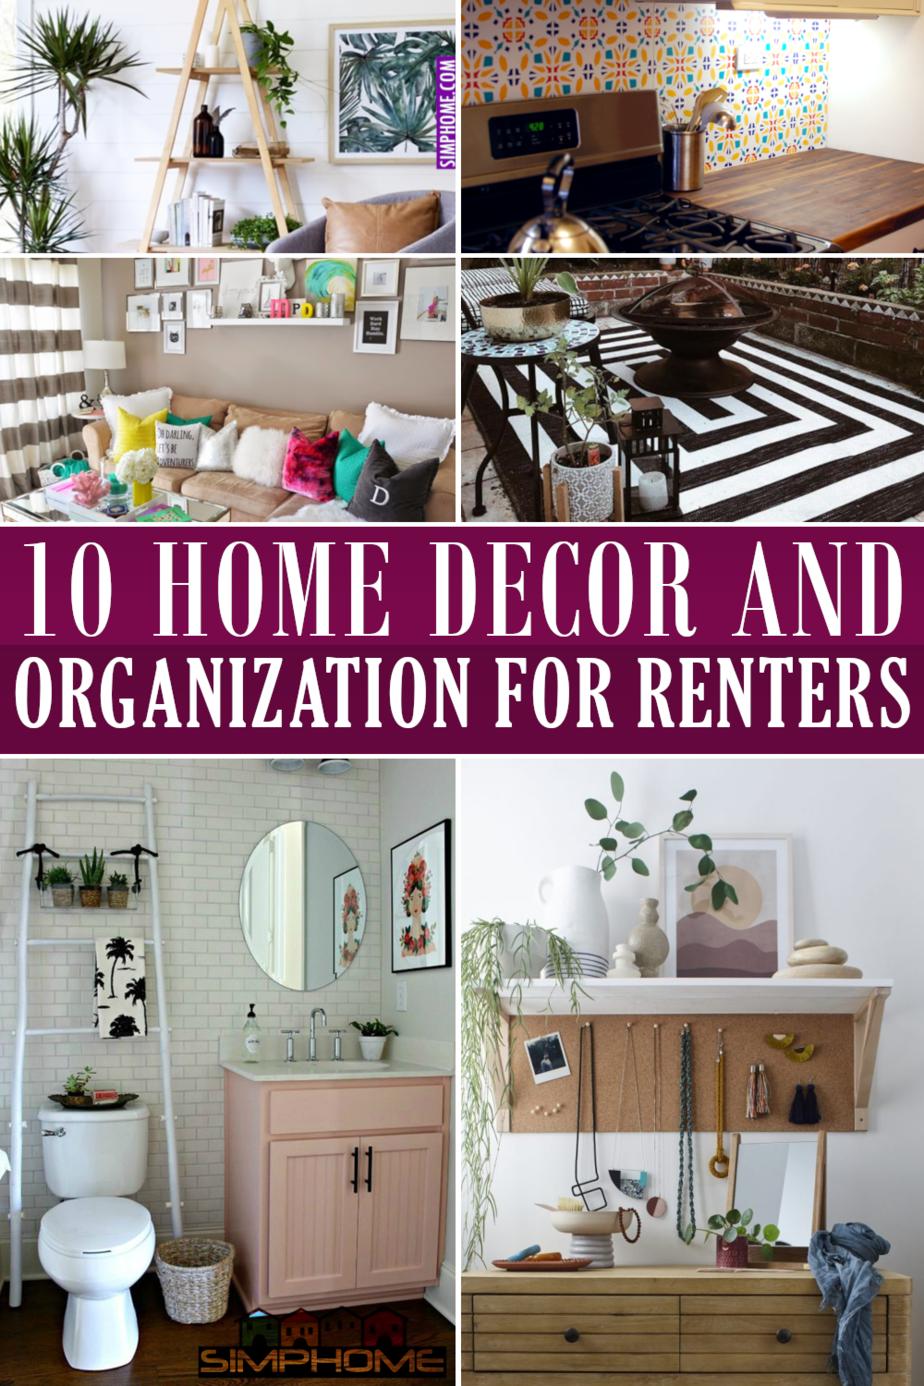 10 Home Decor Ideas and Organization Hacks for Renters Featured Image via Simphome.com